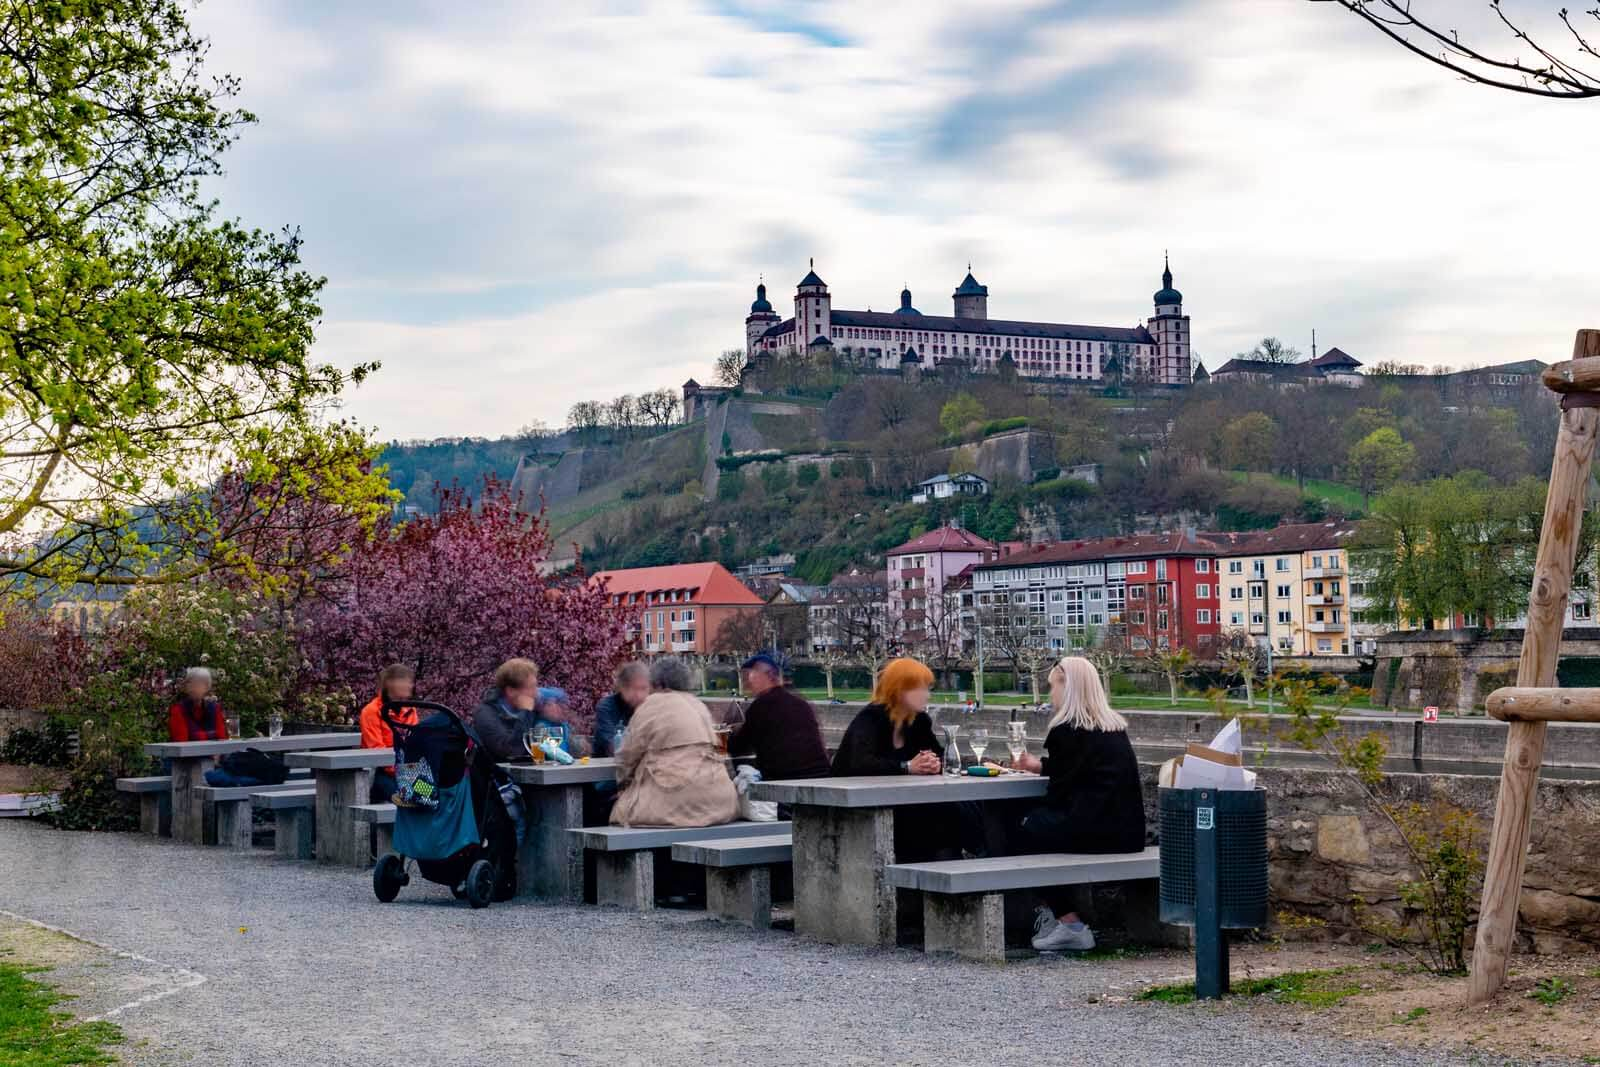 Alter Kranen beer garden along the river in Würzburg Germany